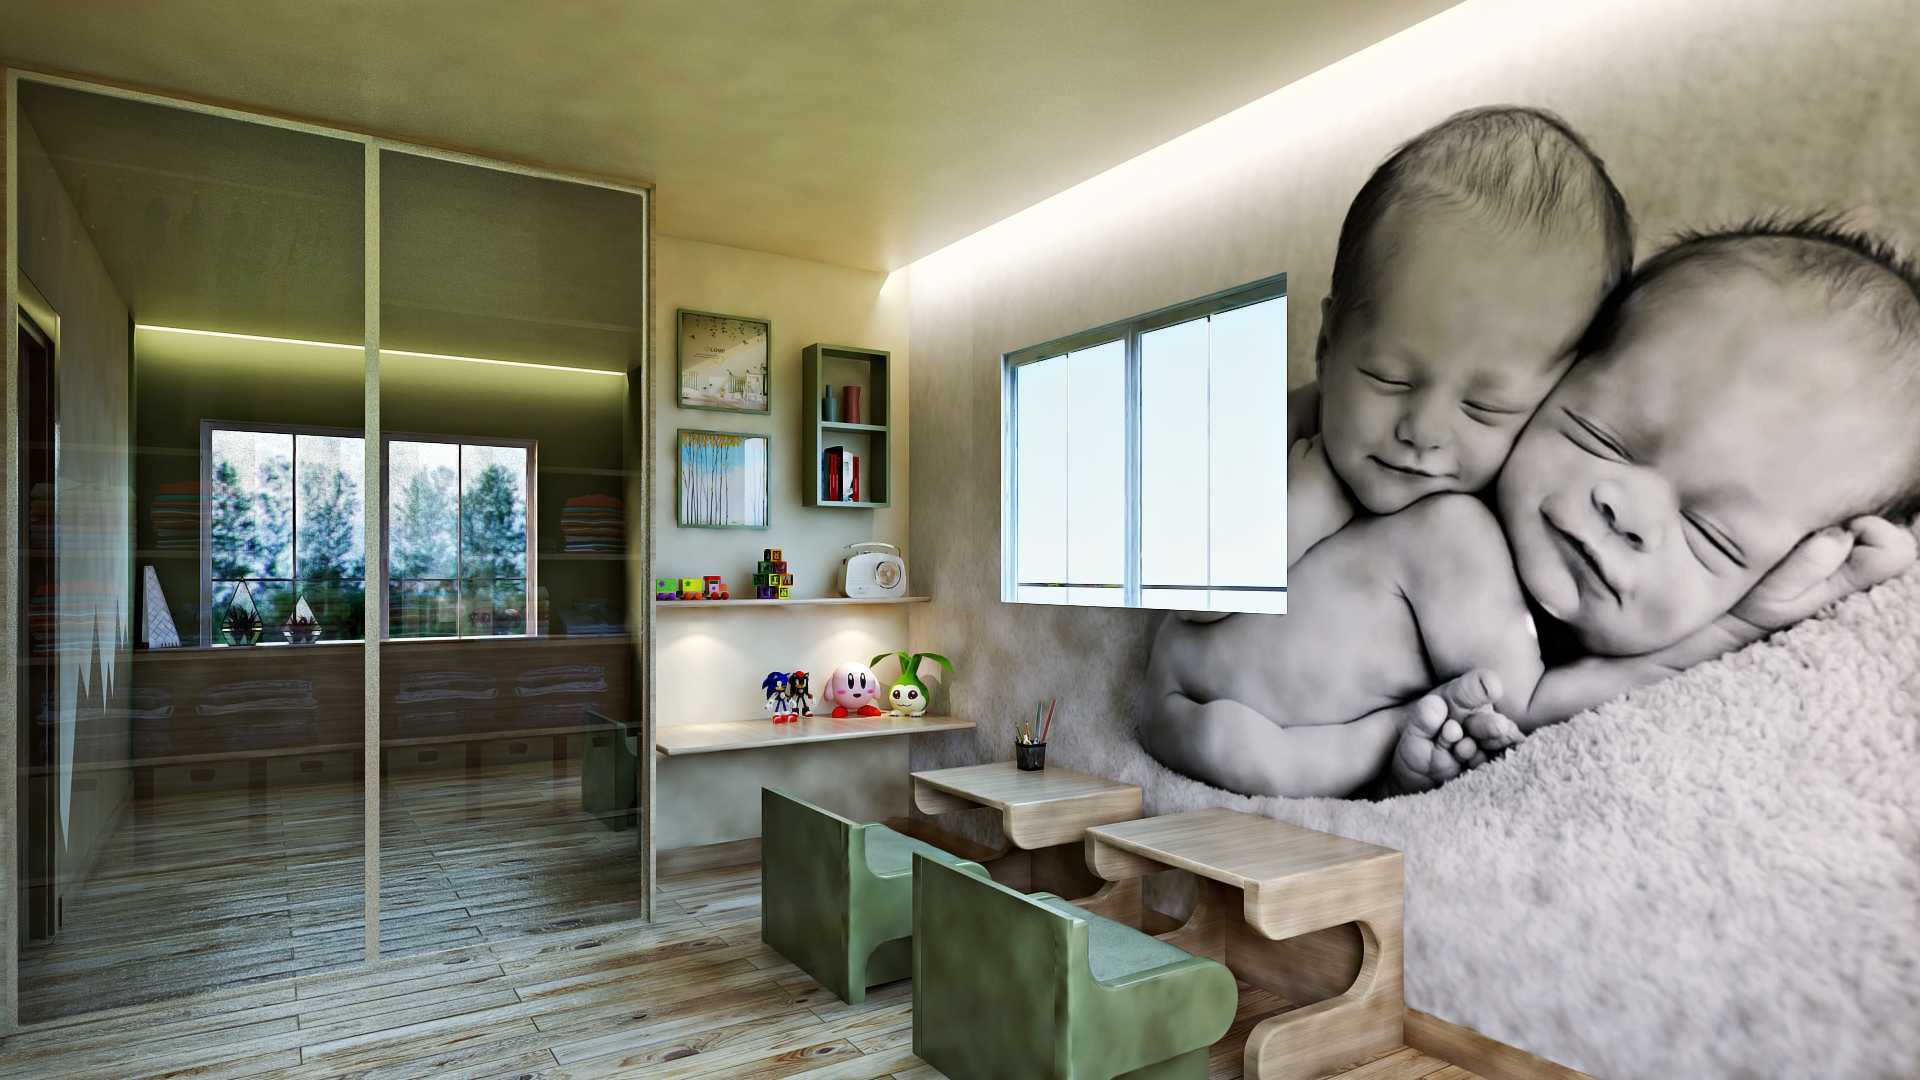 Hive Design & Build Kamar Anak Permata Hijau Jakarta Barat Jakarta Barat Kids Bedroom Skandinavia  26568